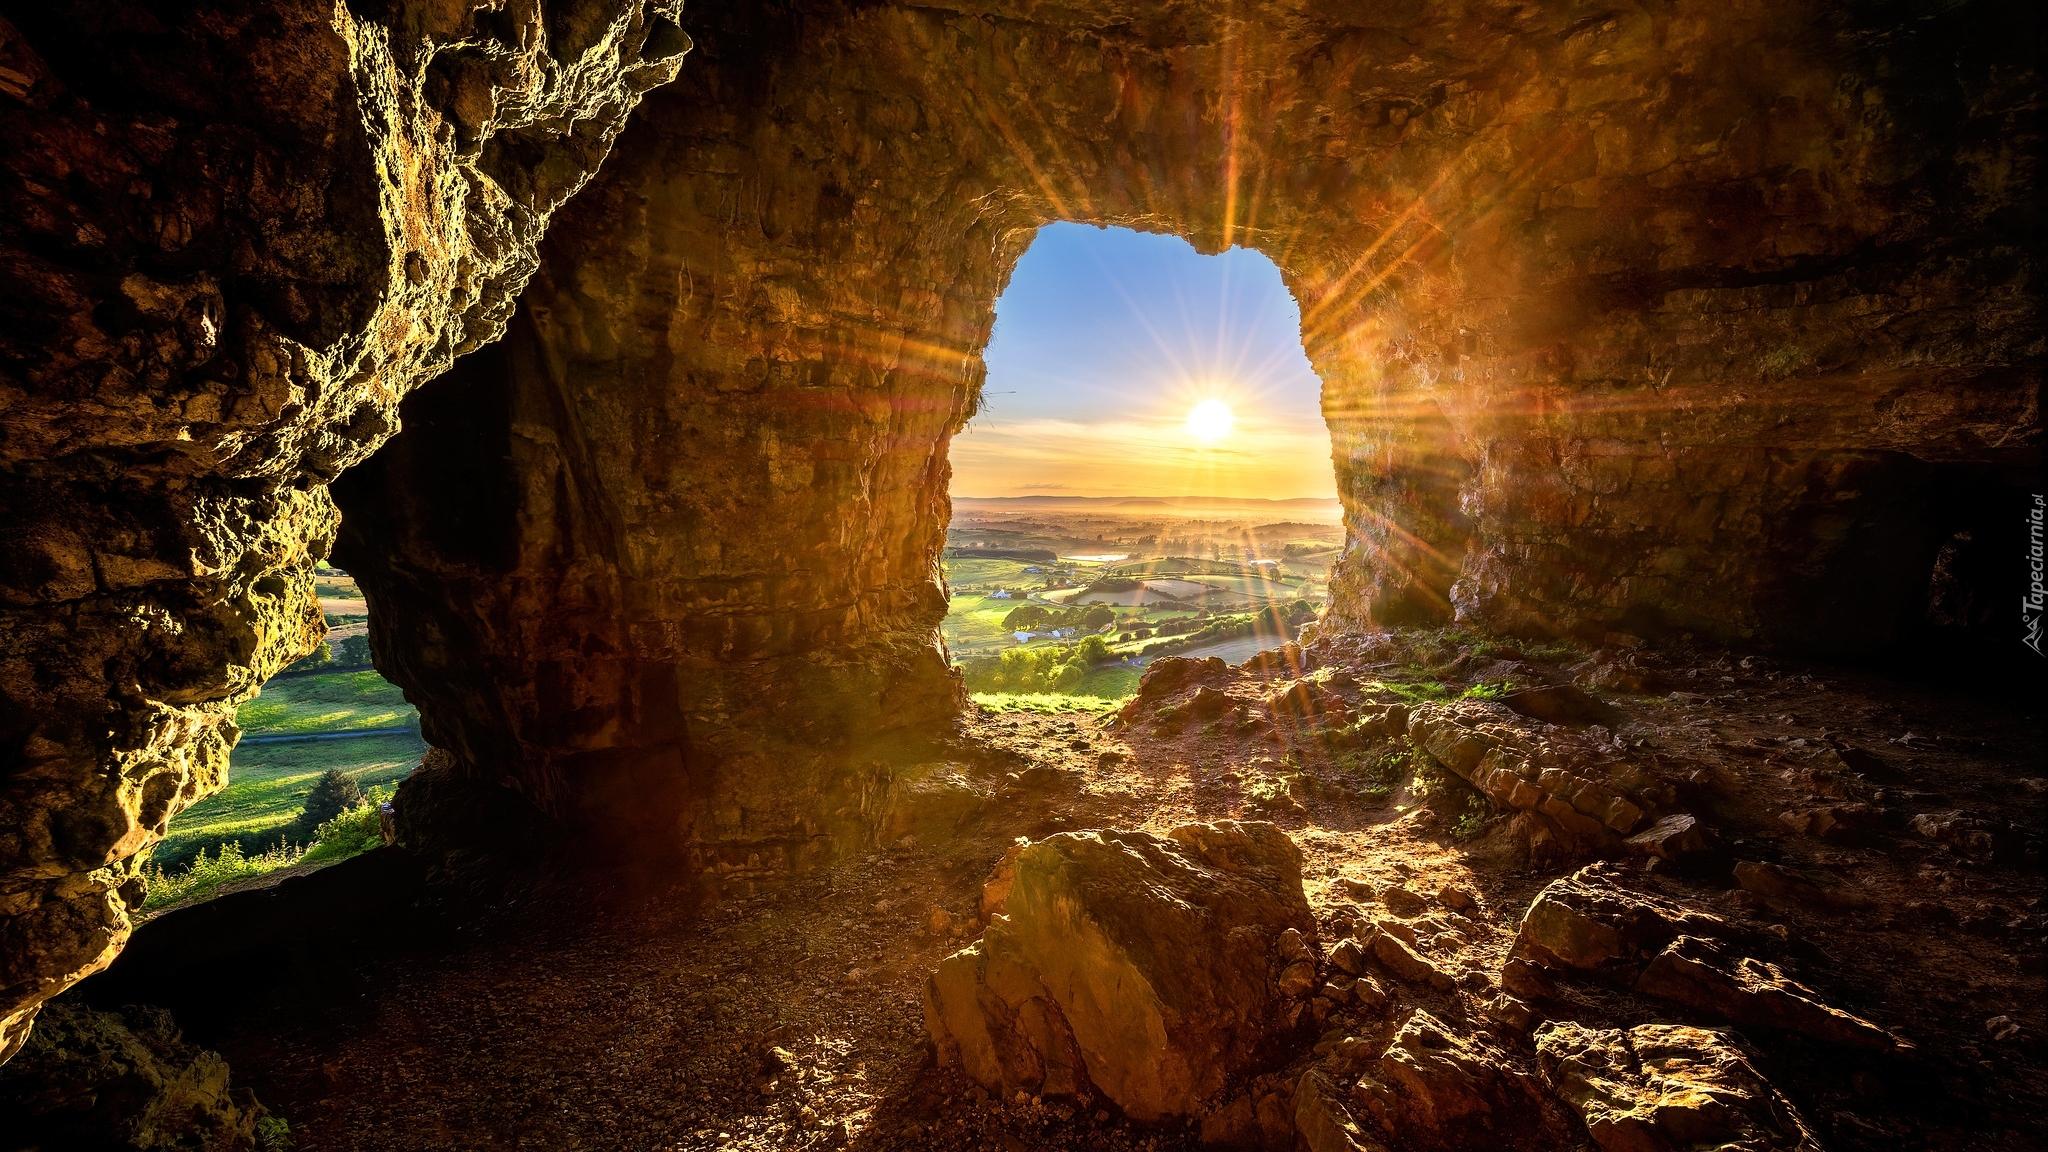 tapeta-jaskinia-caves-of-kesh-w-promieniach-slonca.jpg